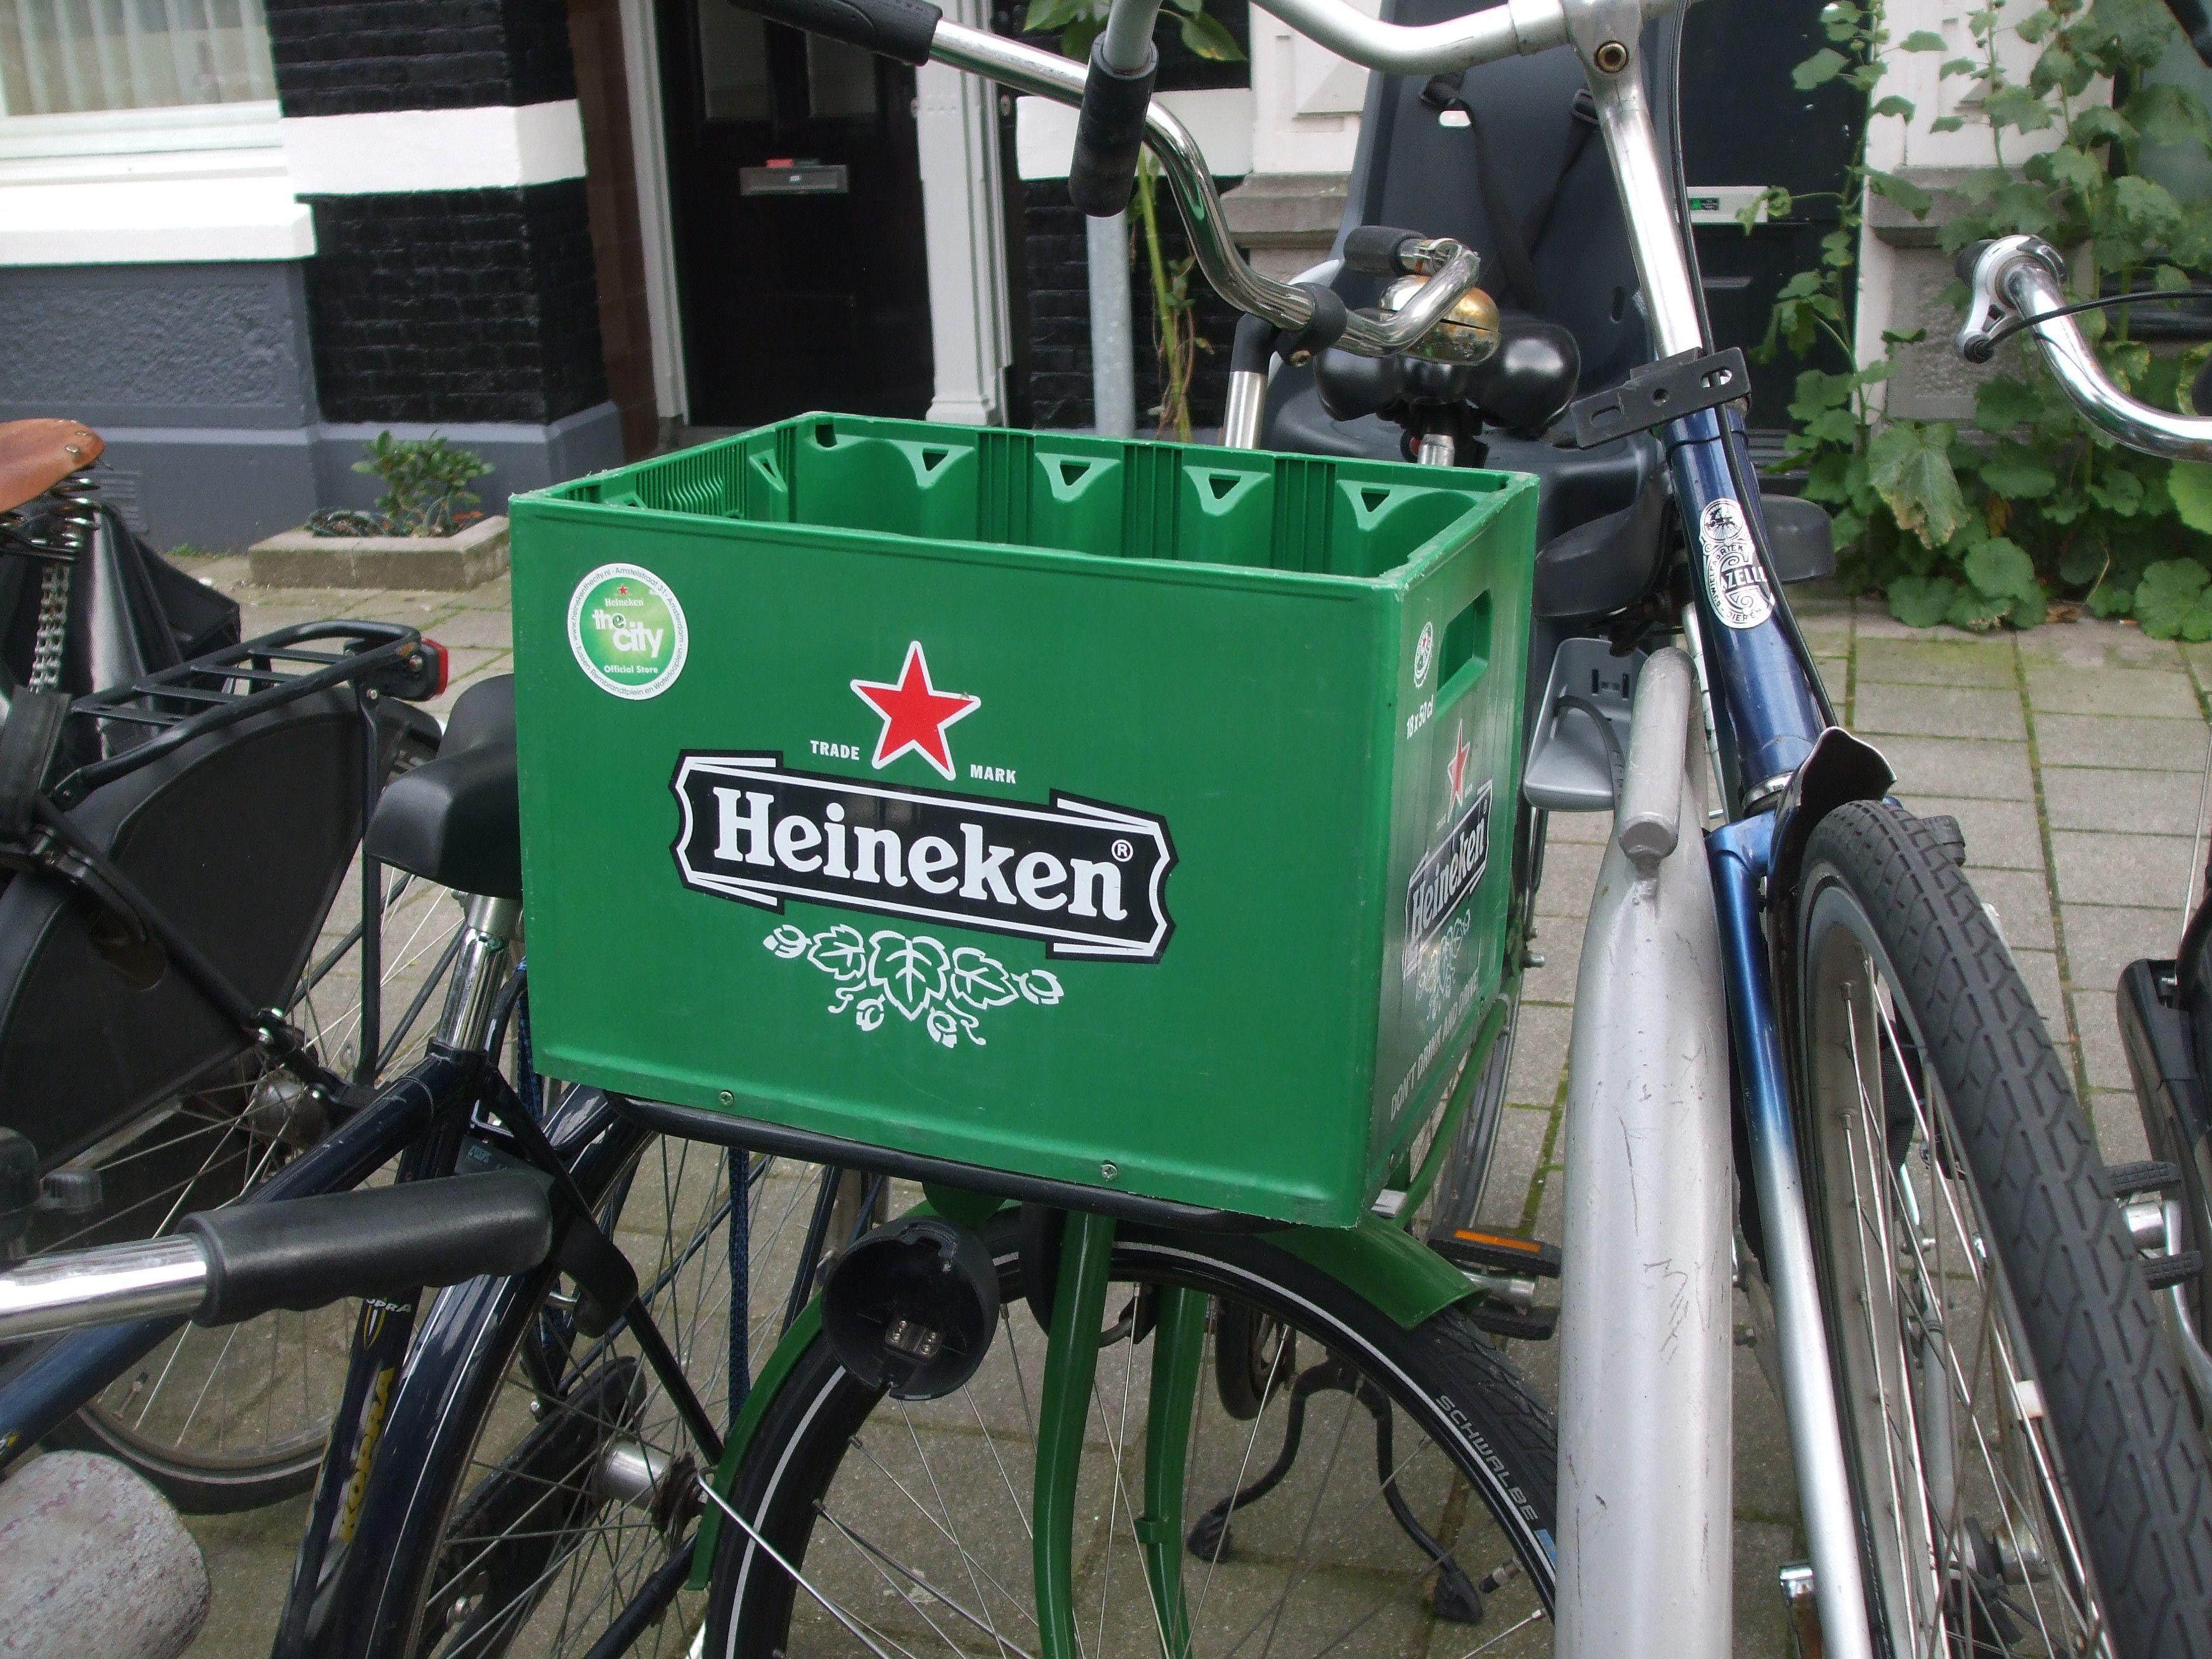 heineken beer plastic bike basket | Bike Baskets | Pinterest